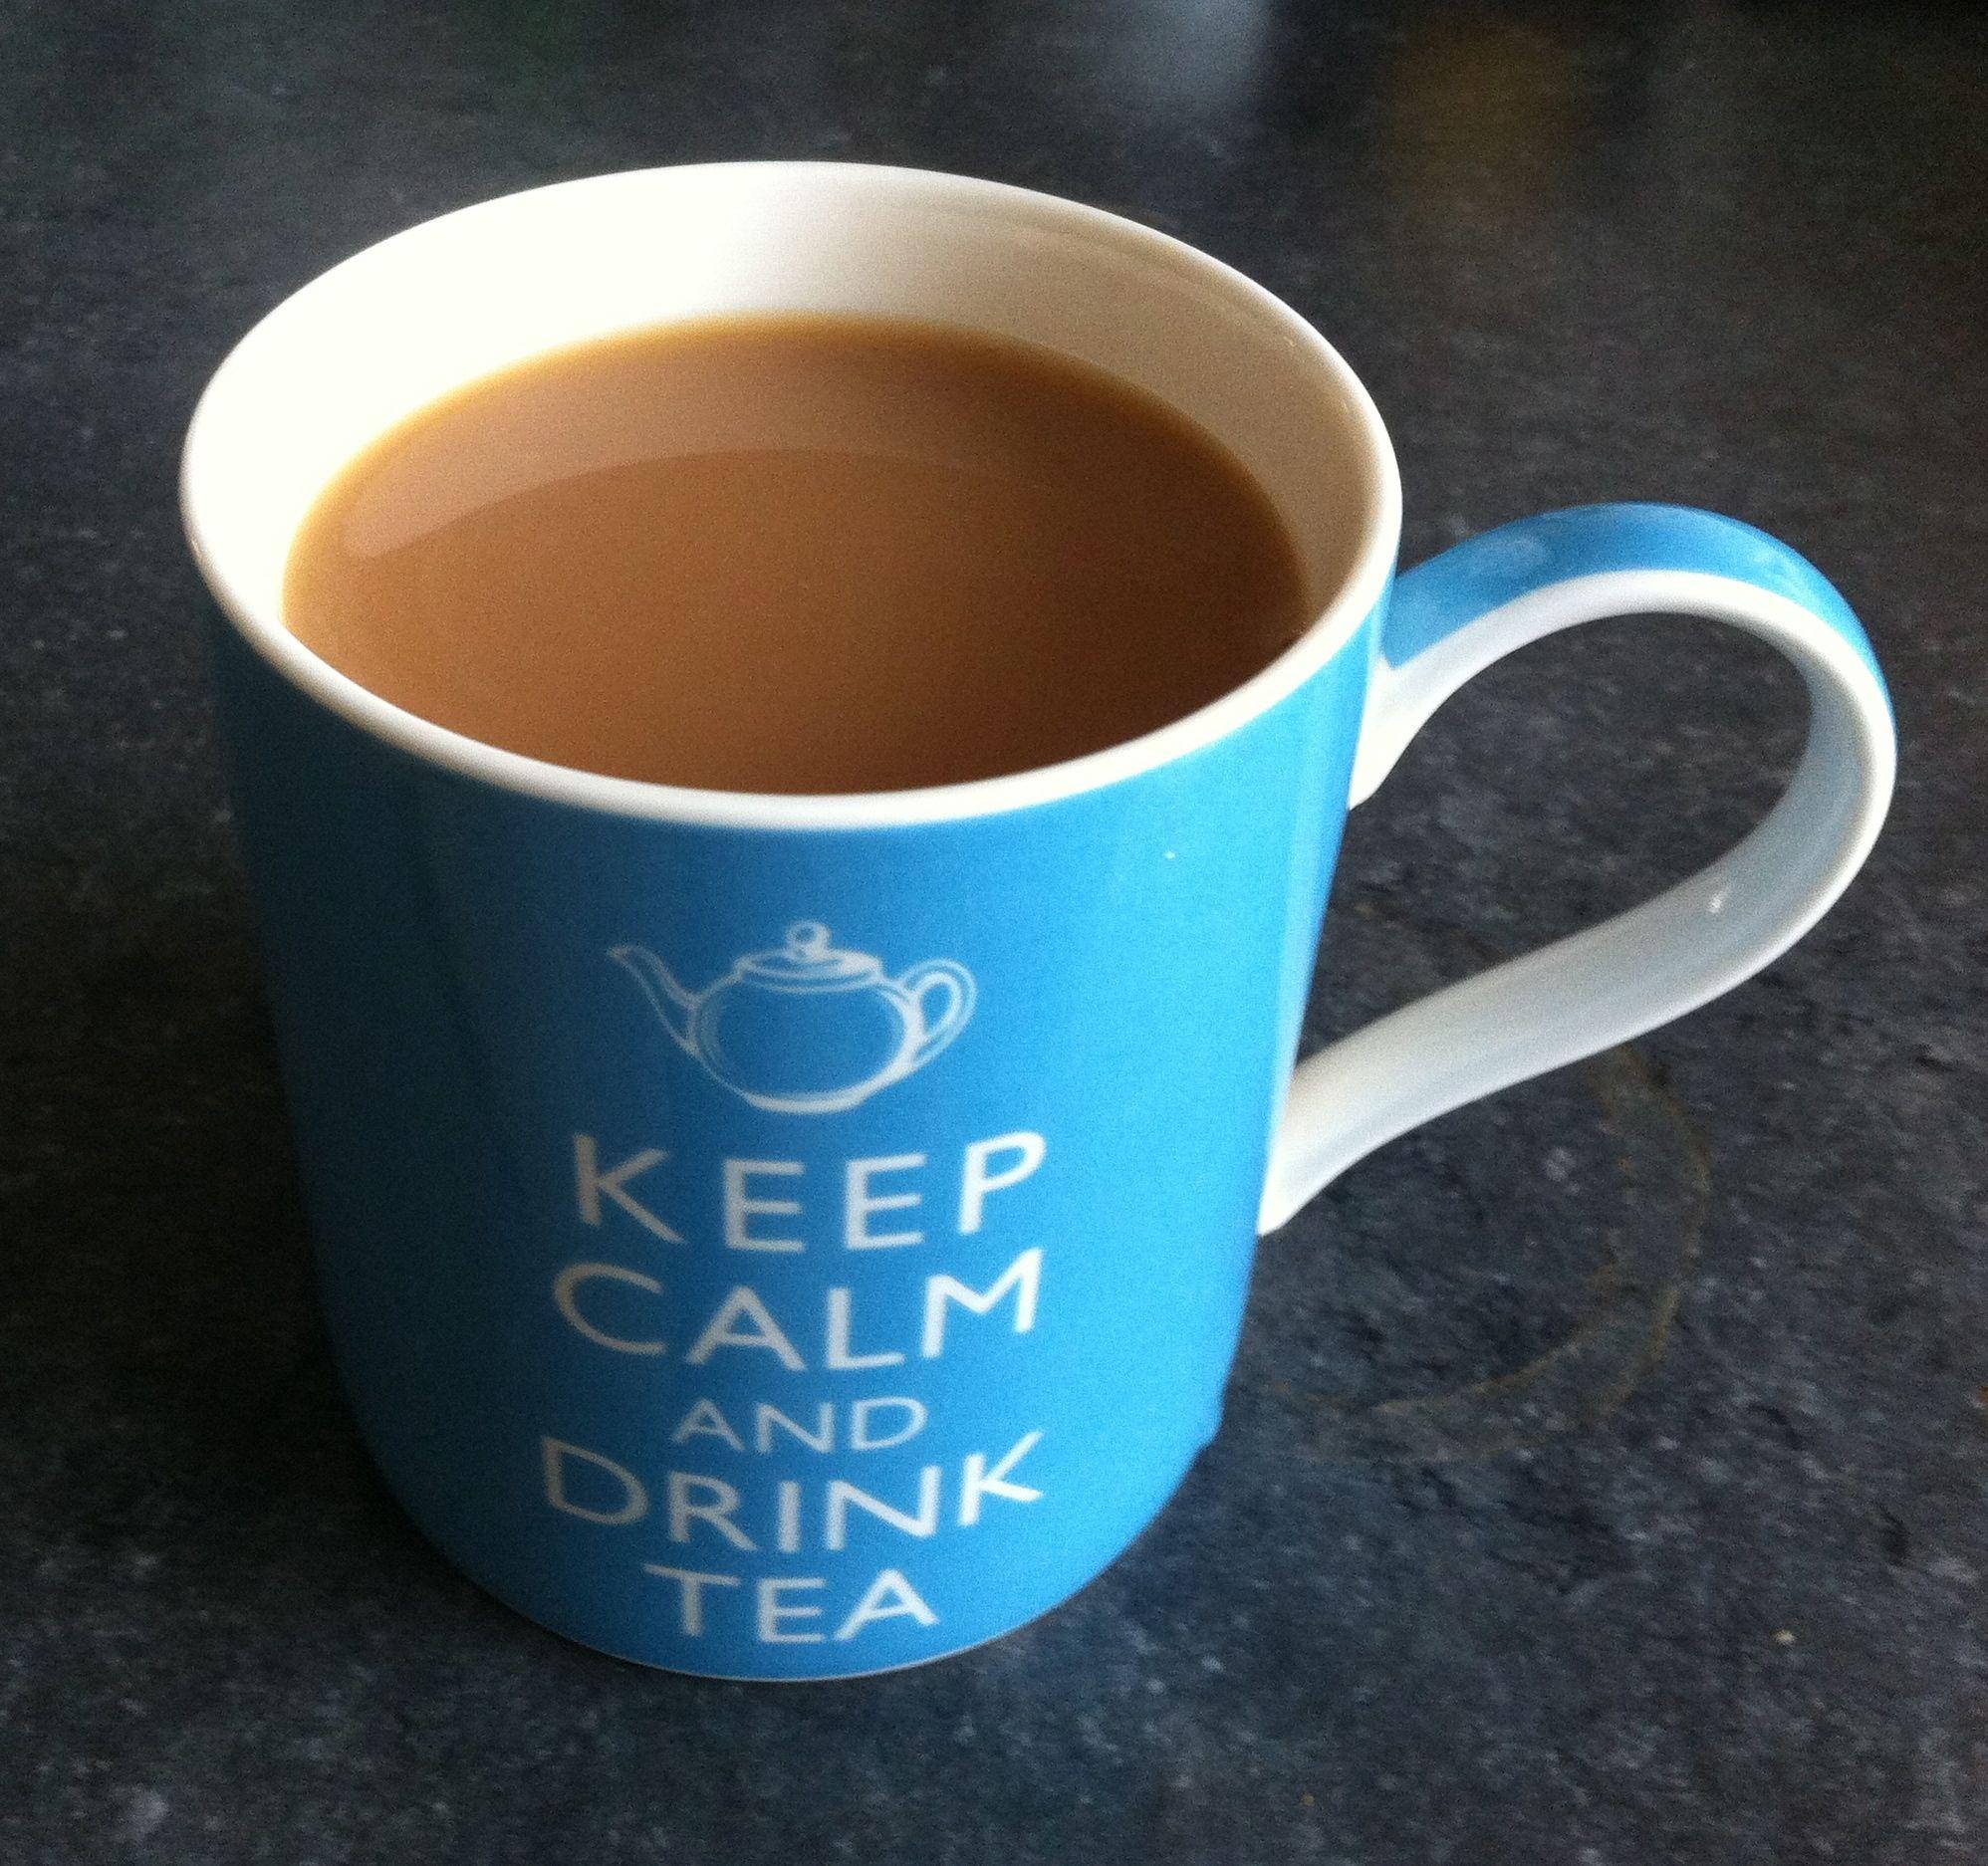 Better Tea-making: Measurements